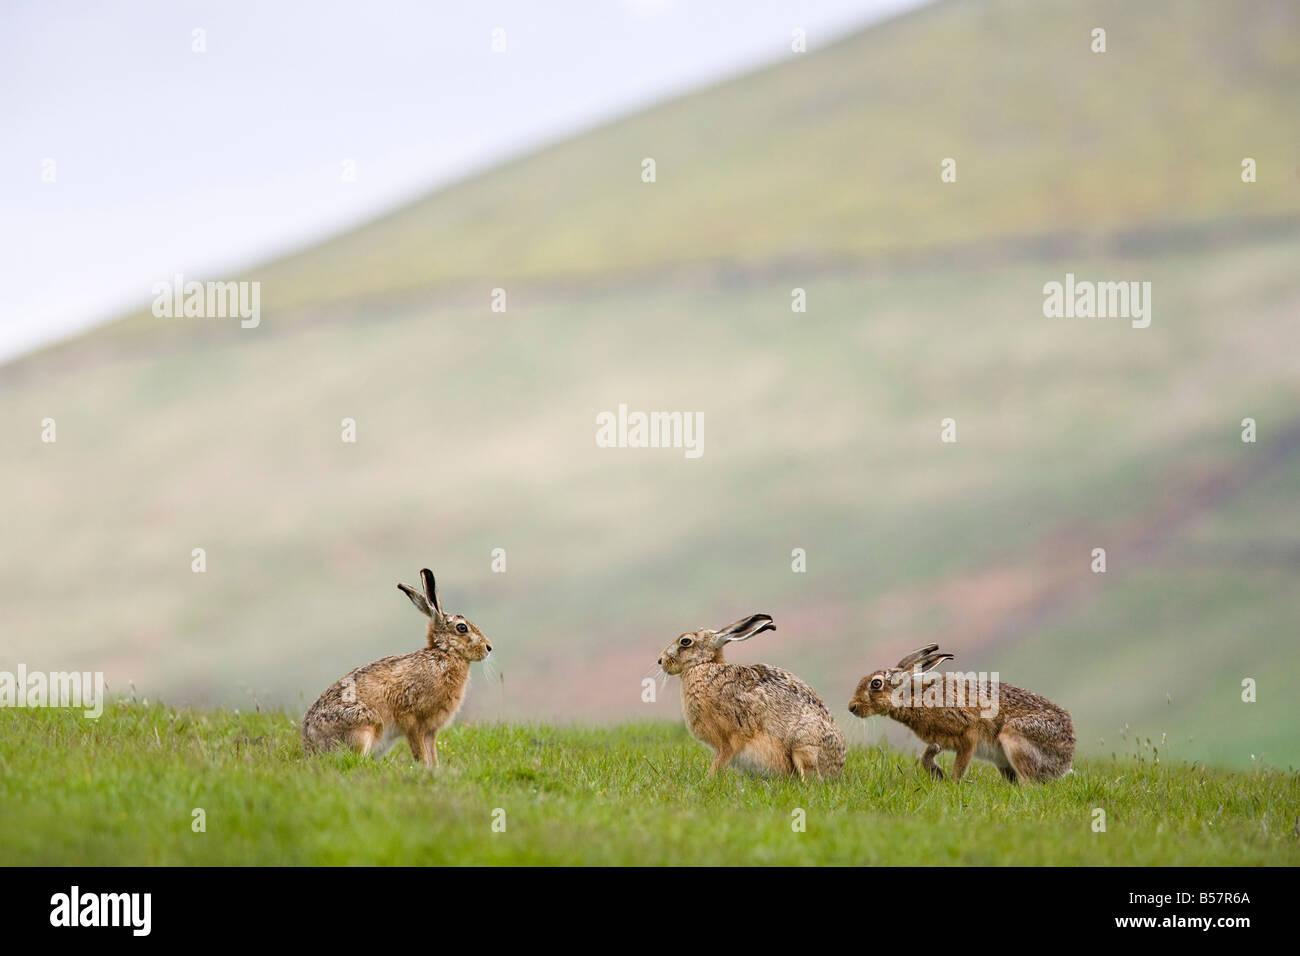 Brown lepre (Lepus europaeus), Inferiore Fairsnape Farm, Bleasdale, Lancashire, Inghilterra, Regno Unito, Europa Immagini Stock